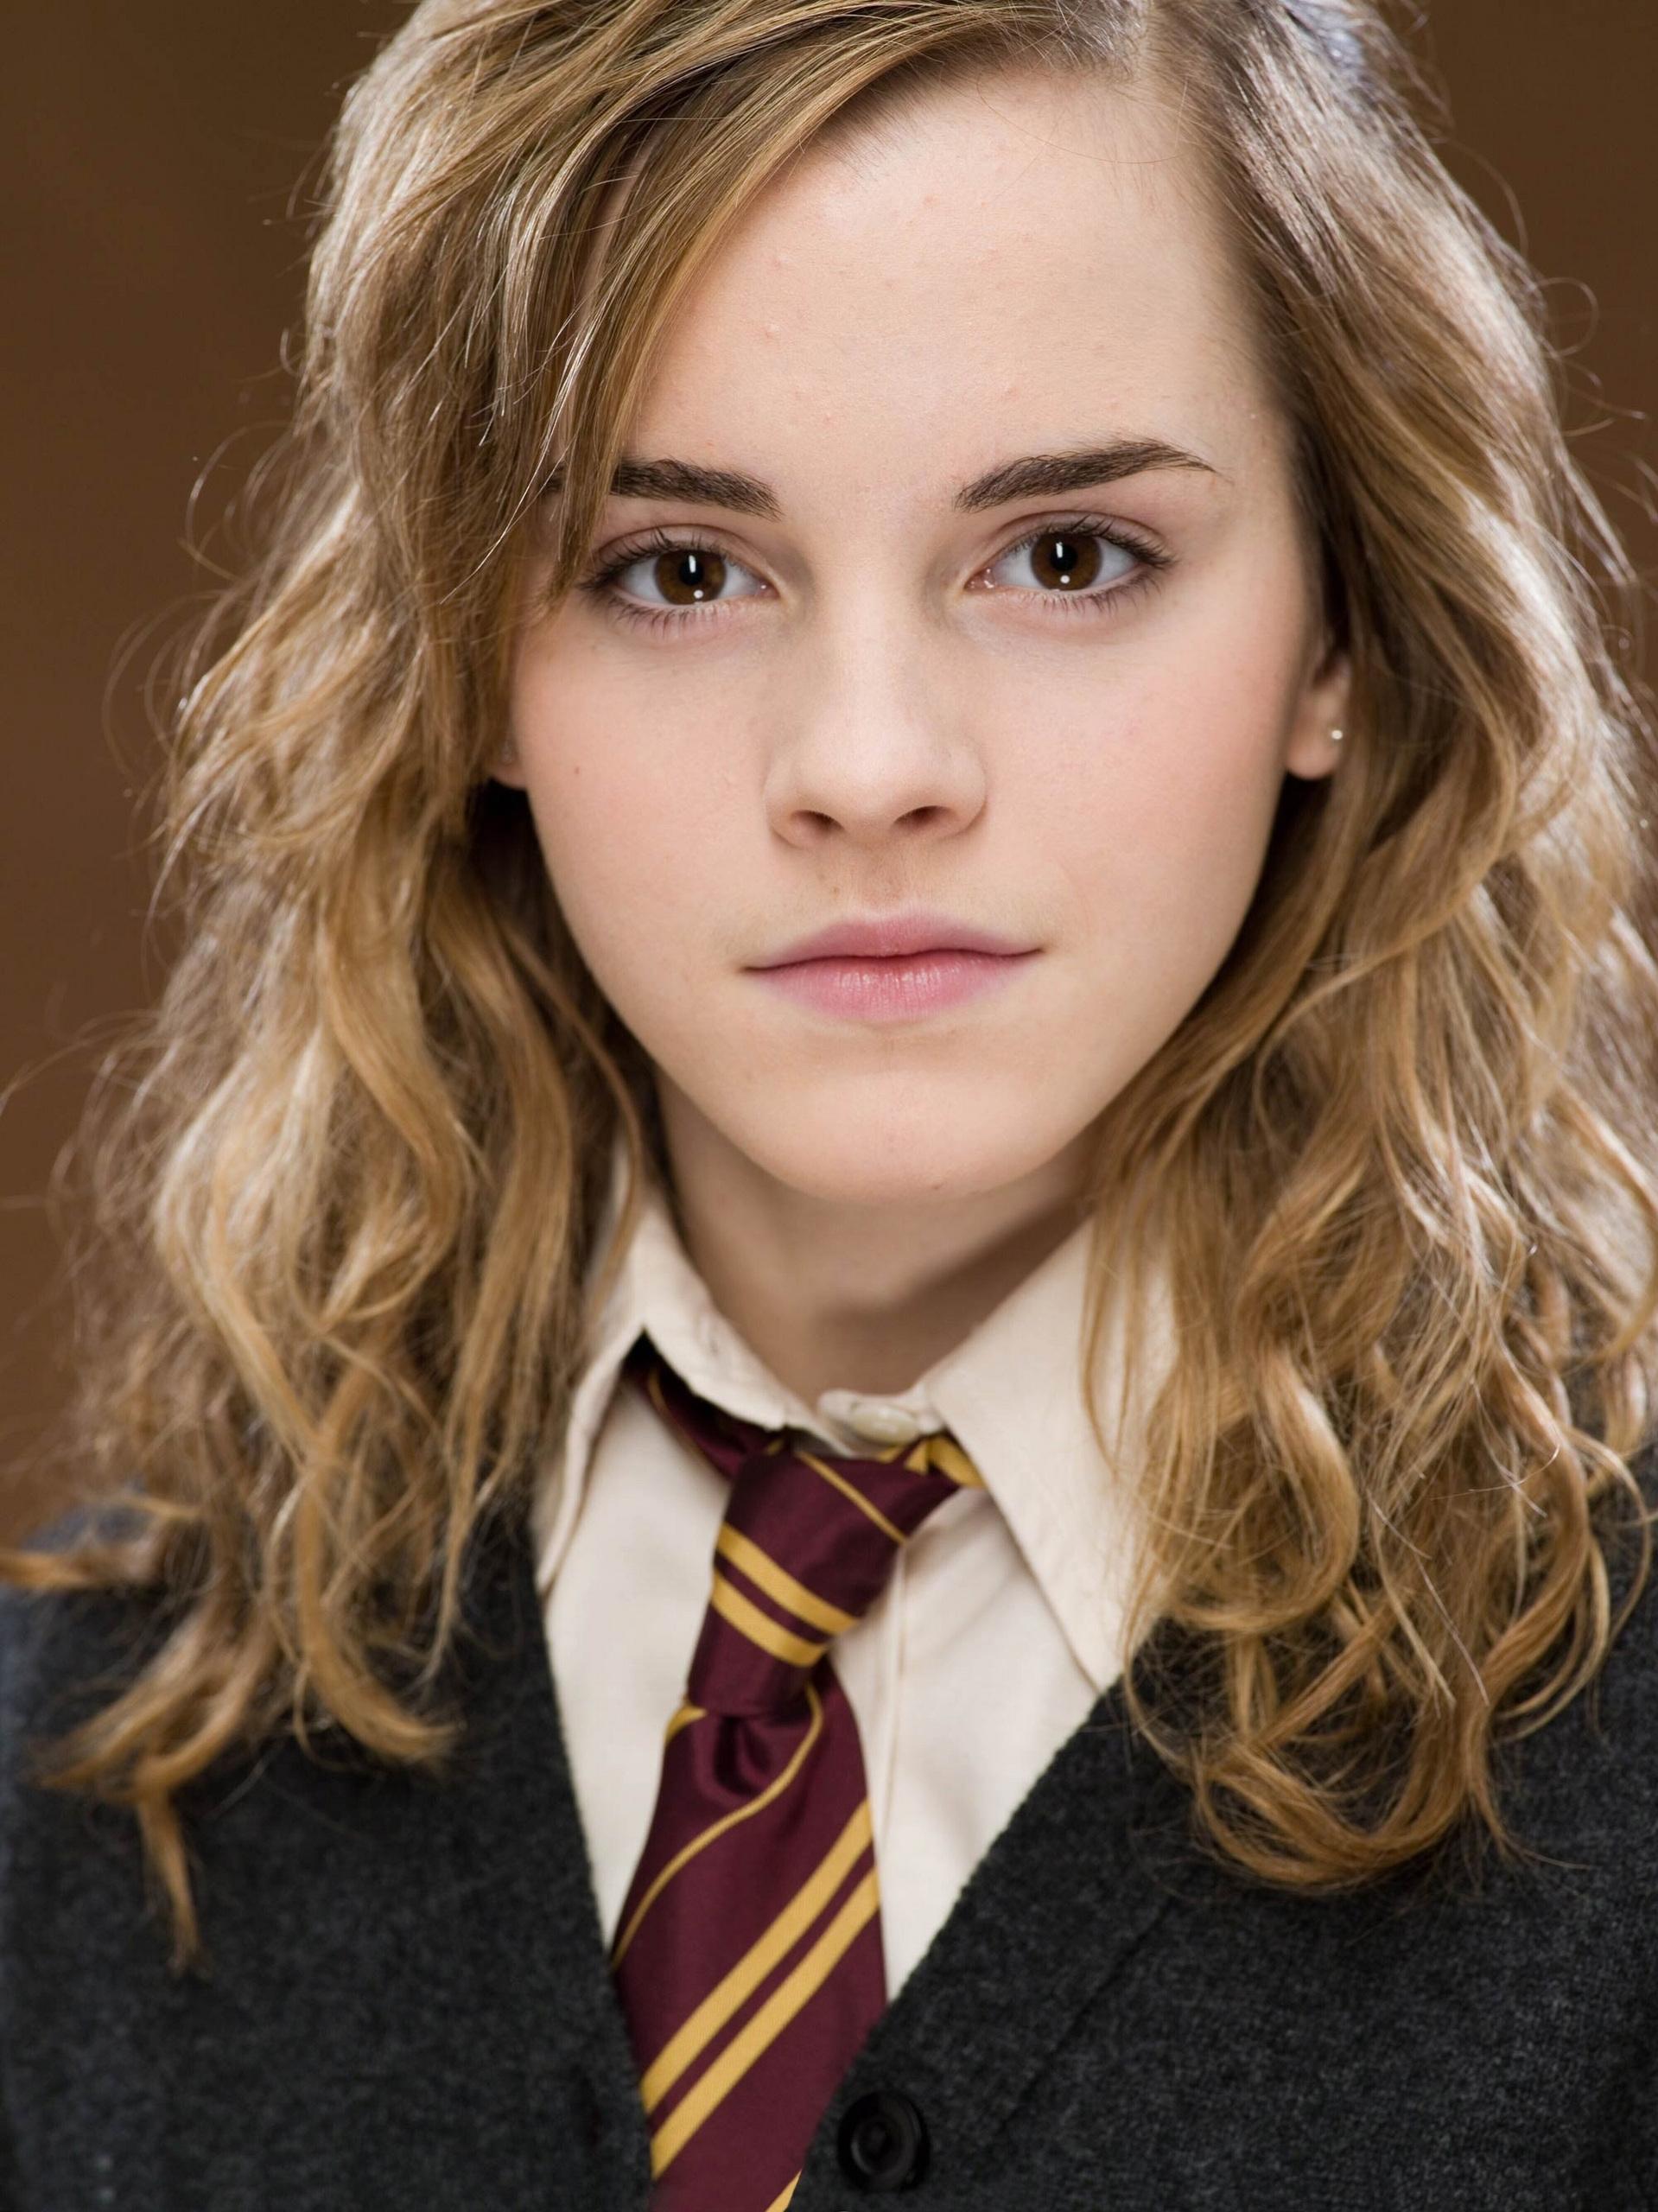 hermione granger - emmacd